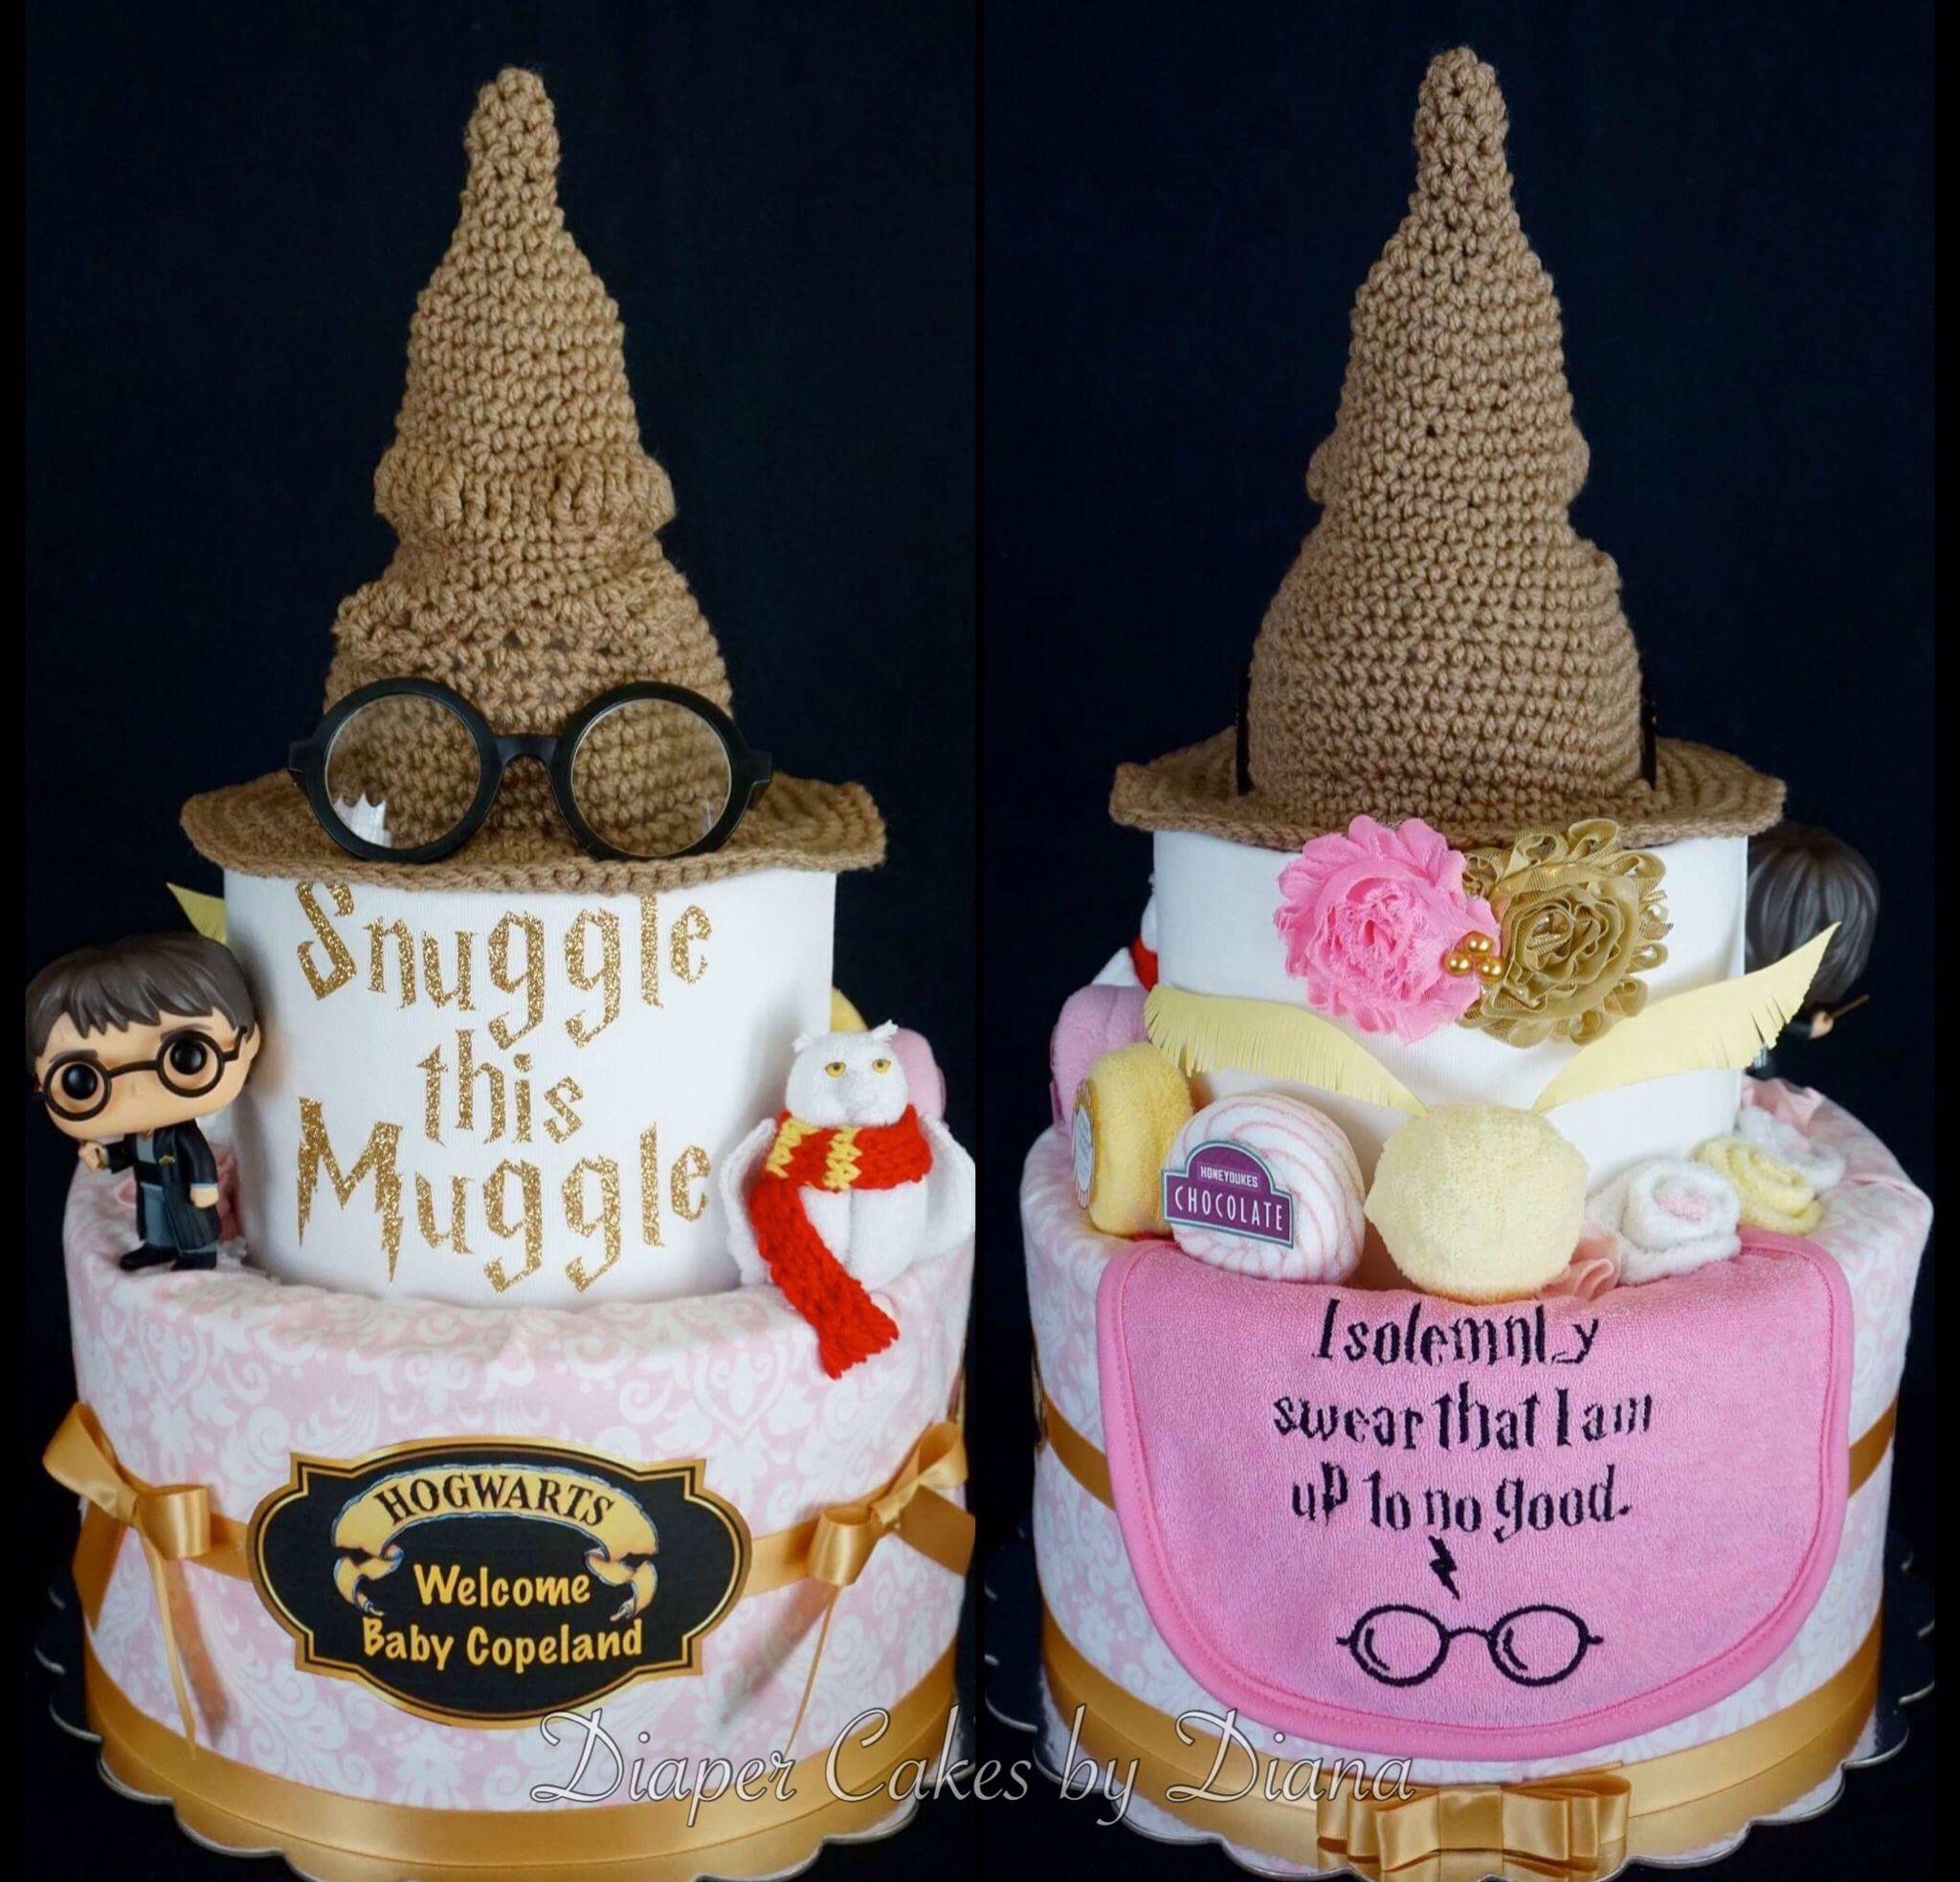 Superb Harry Potter Diaper Cake Www.facebook.com/DiaperCakesbyDiana